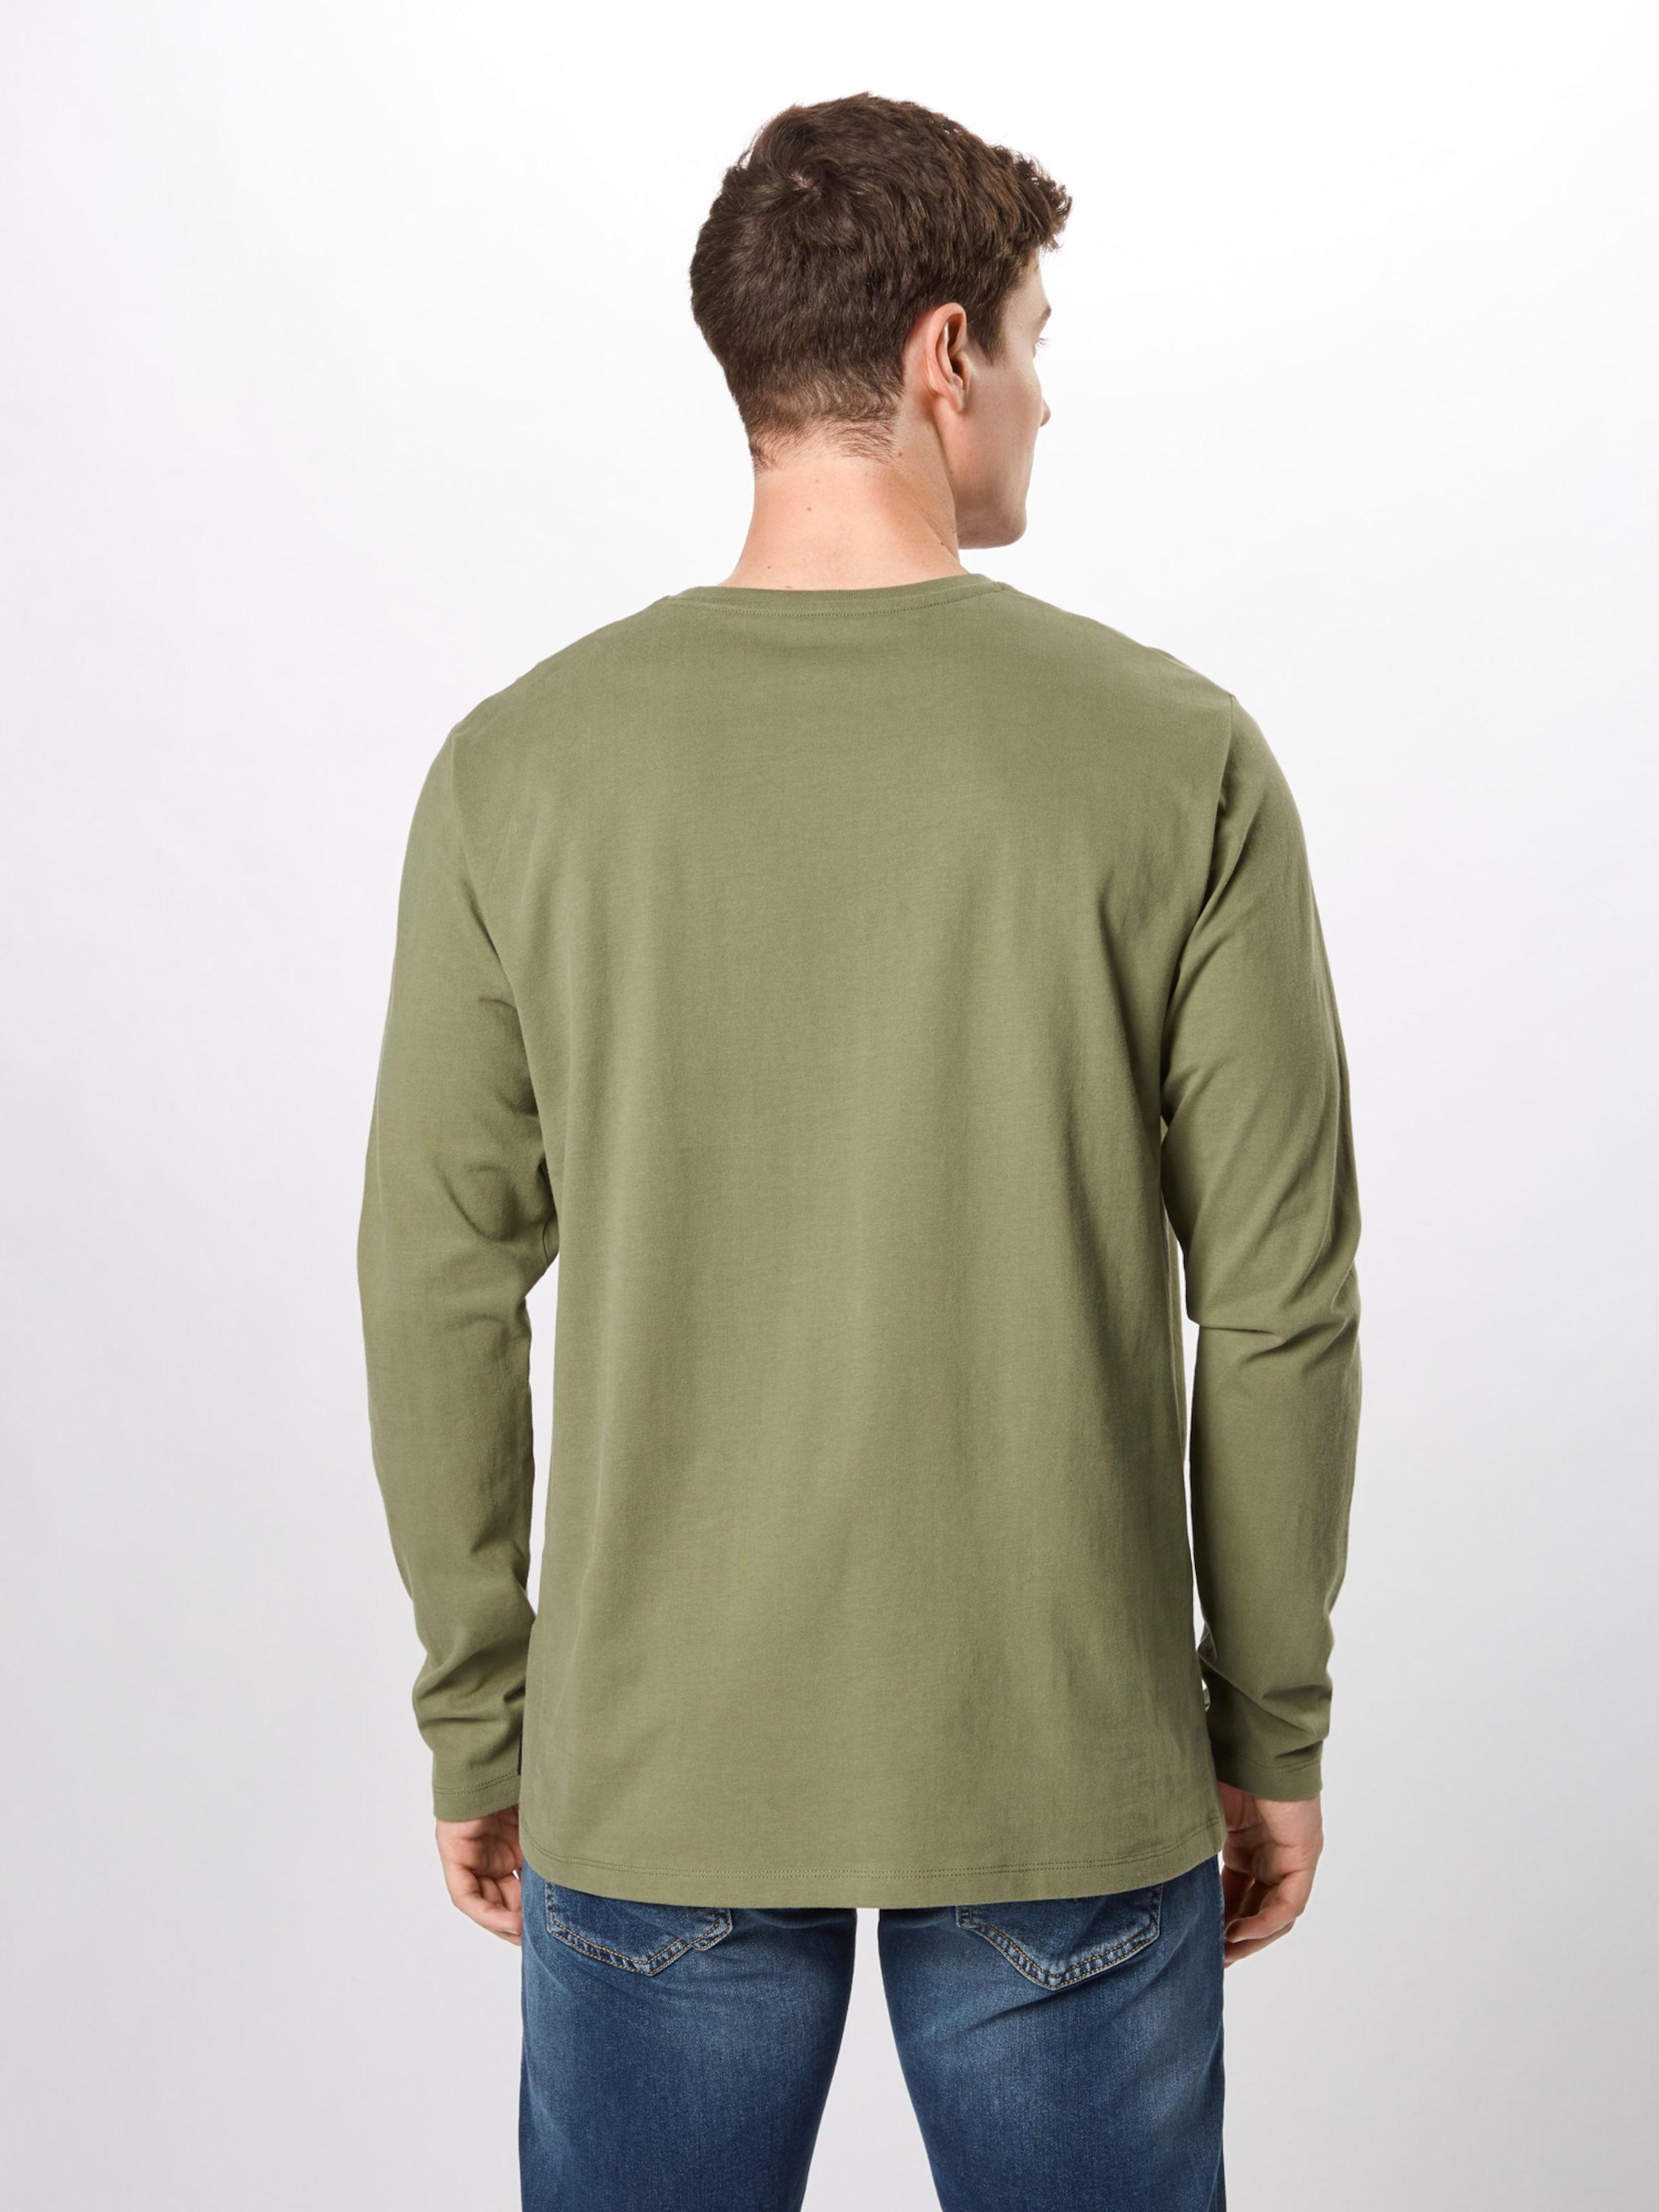 Shirt Shirt Shirt Khaki Khaki In Esprit Esprit Esprit In In Khaki Esprit Shirt In LSMVqzpUG